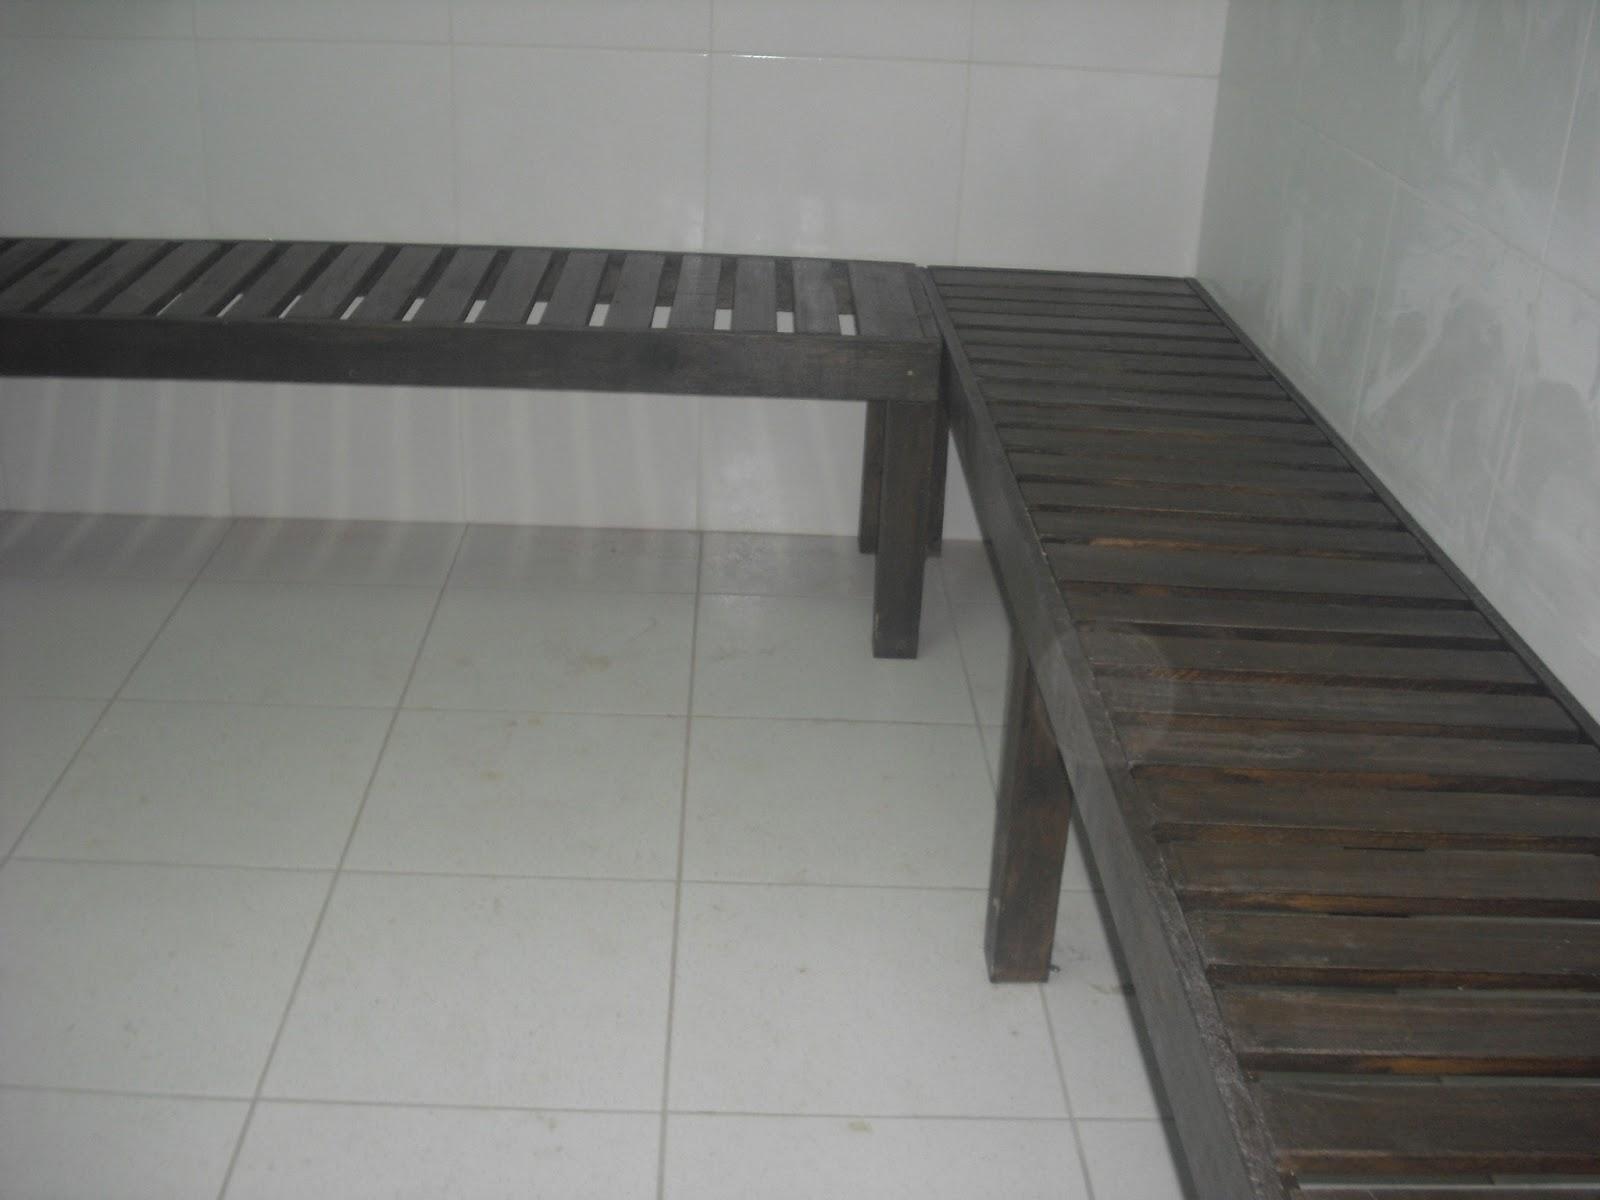 JP Cadeiras Artesanais: bancos de madeira maciça para vestiario #57504A 1600x1200